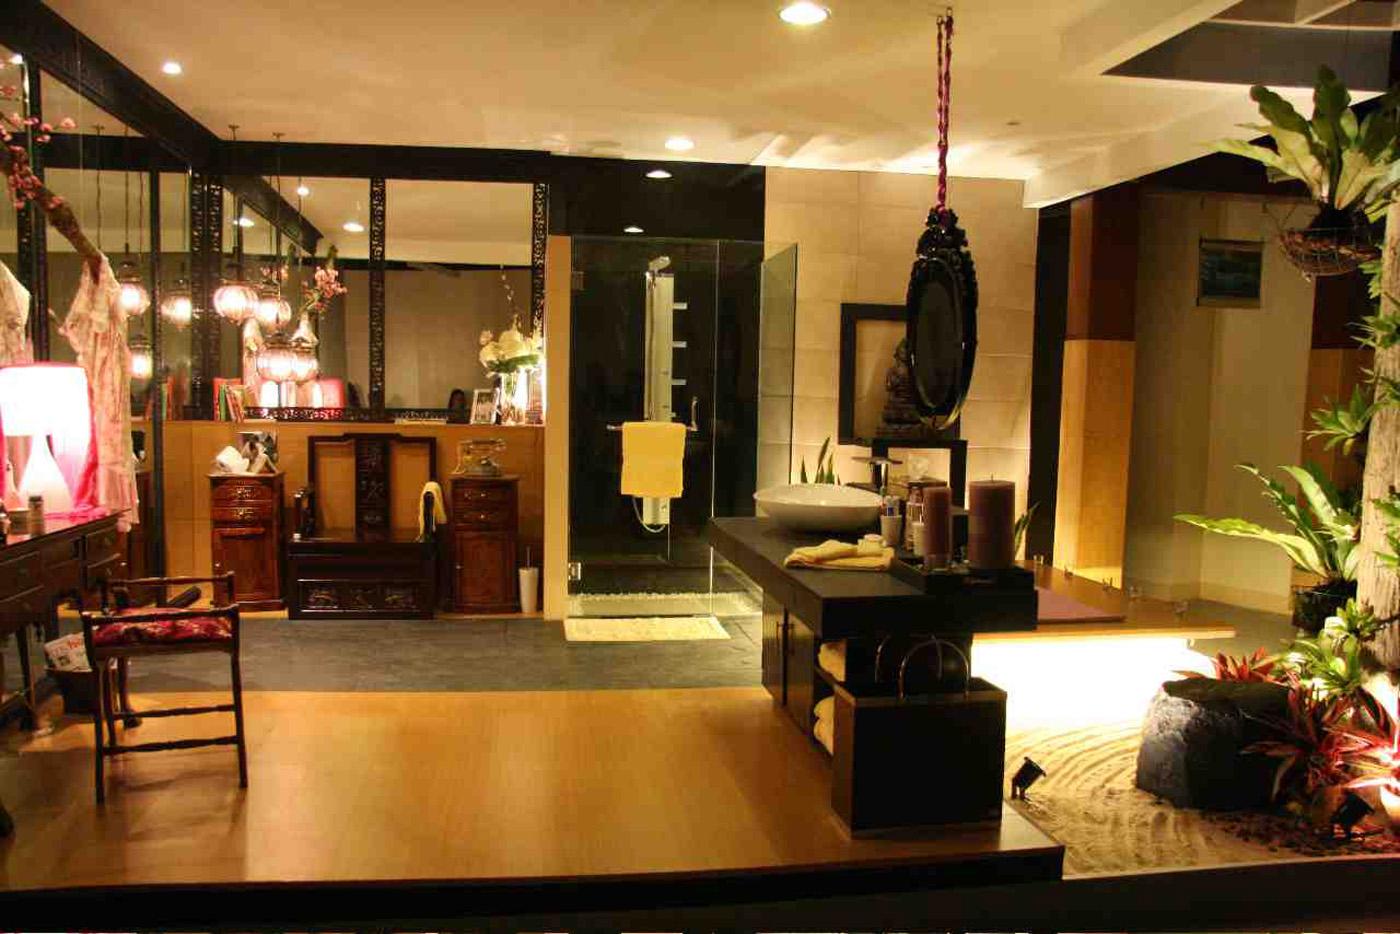 Serene Asian Interior Design For Peaceful And Elegant